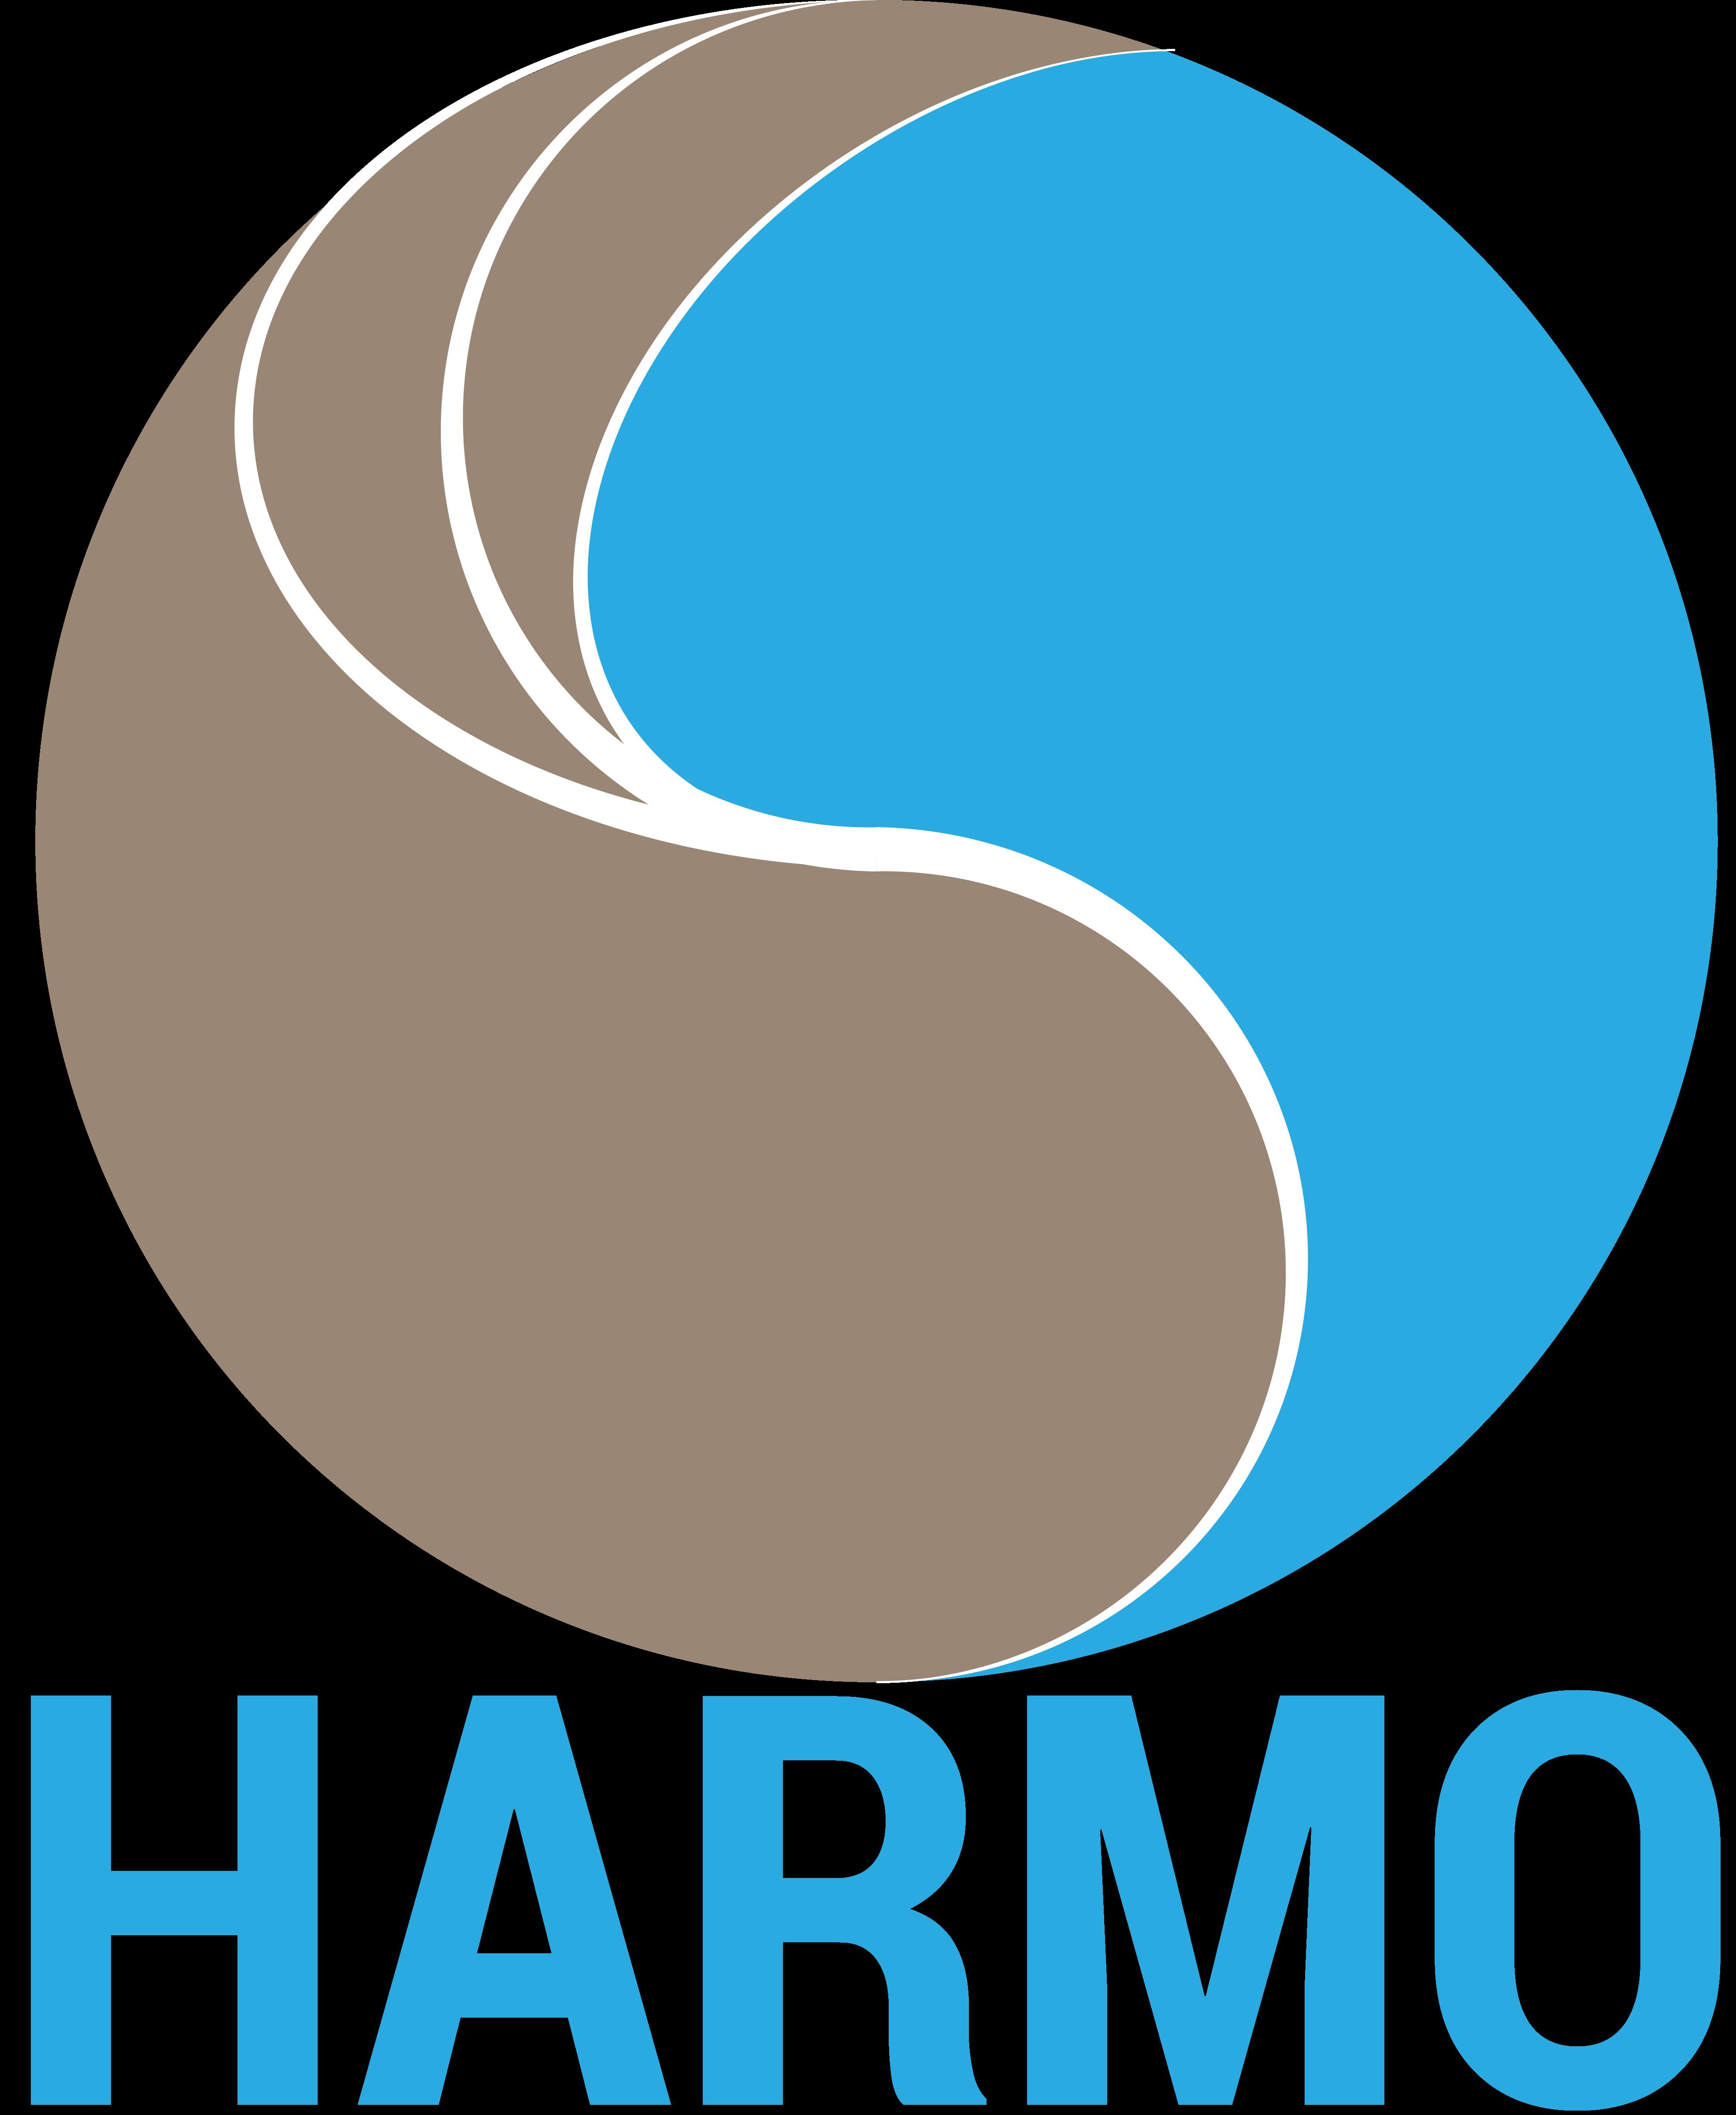 harmo